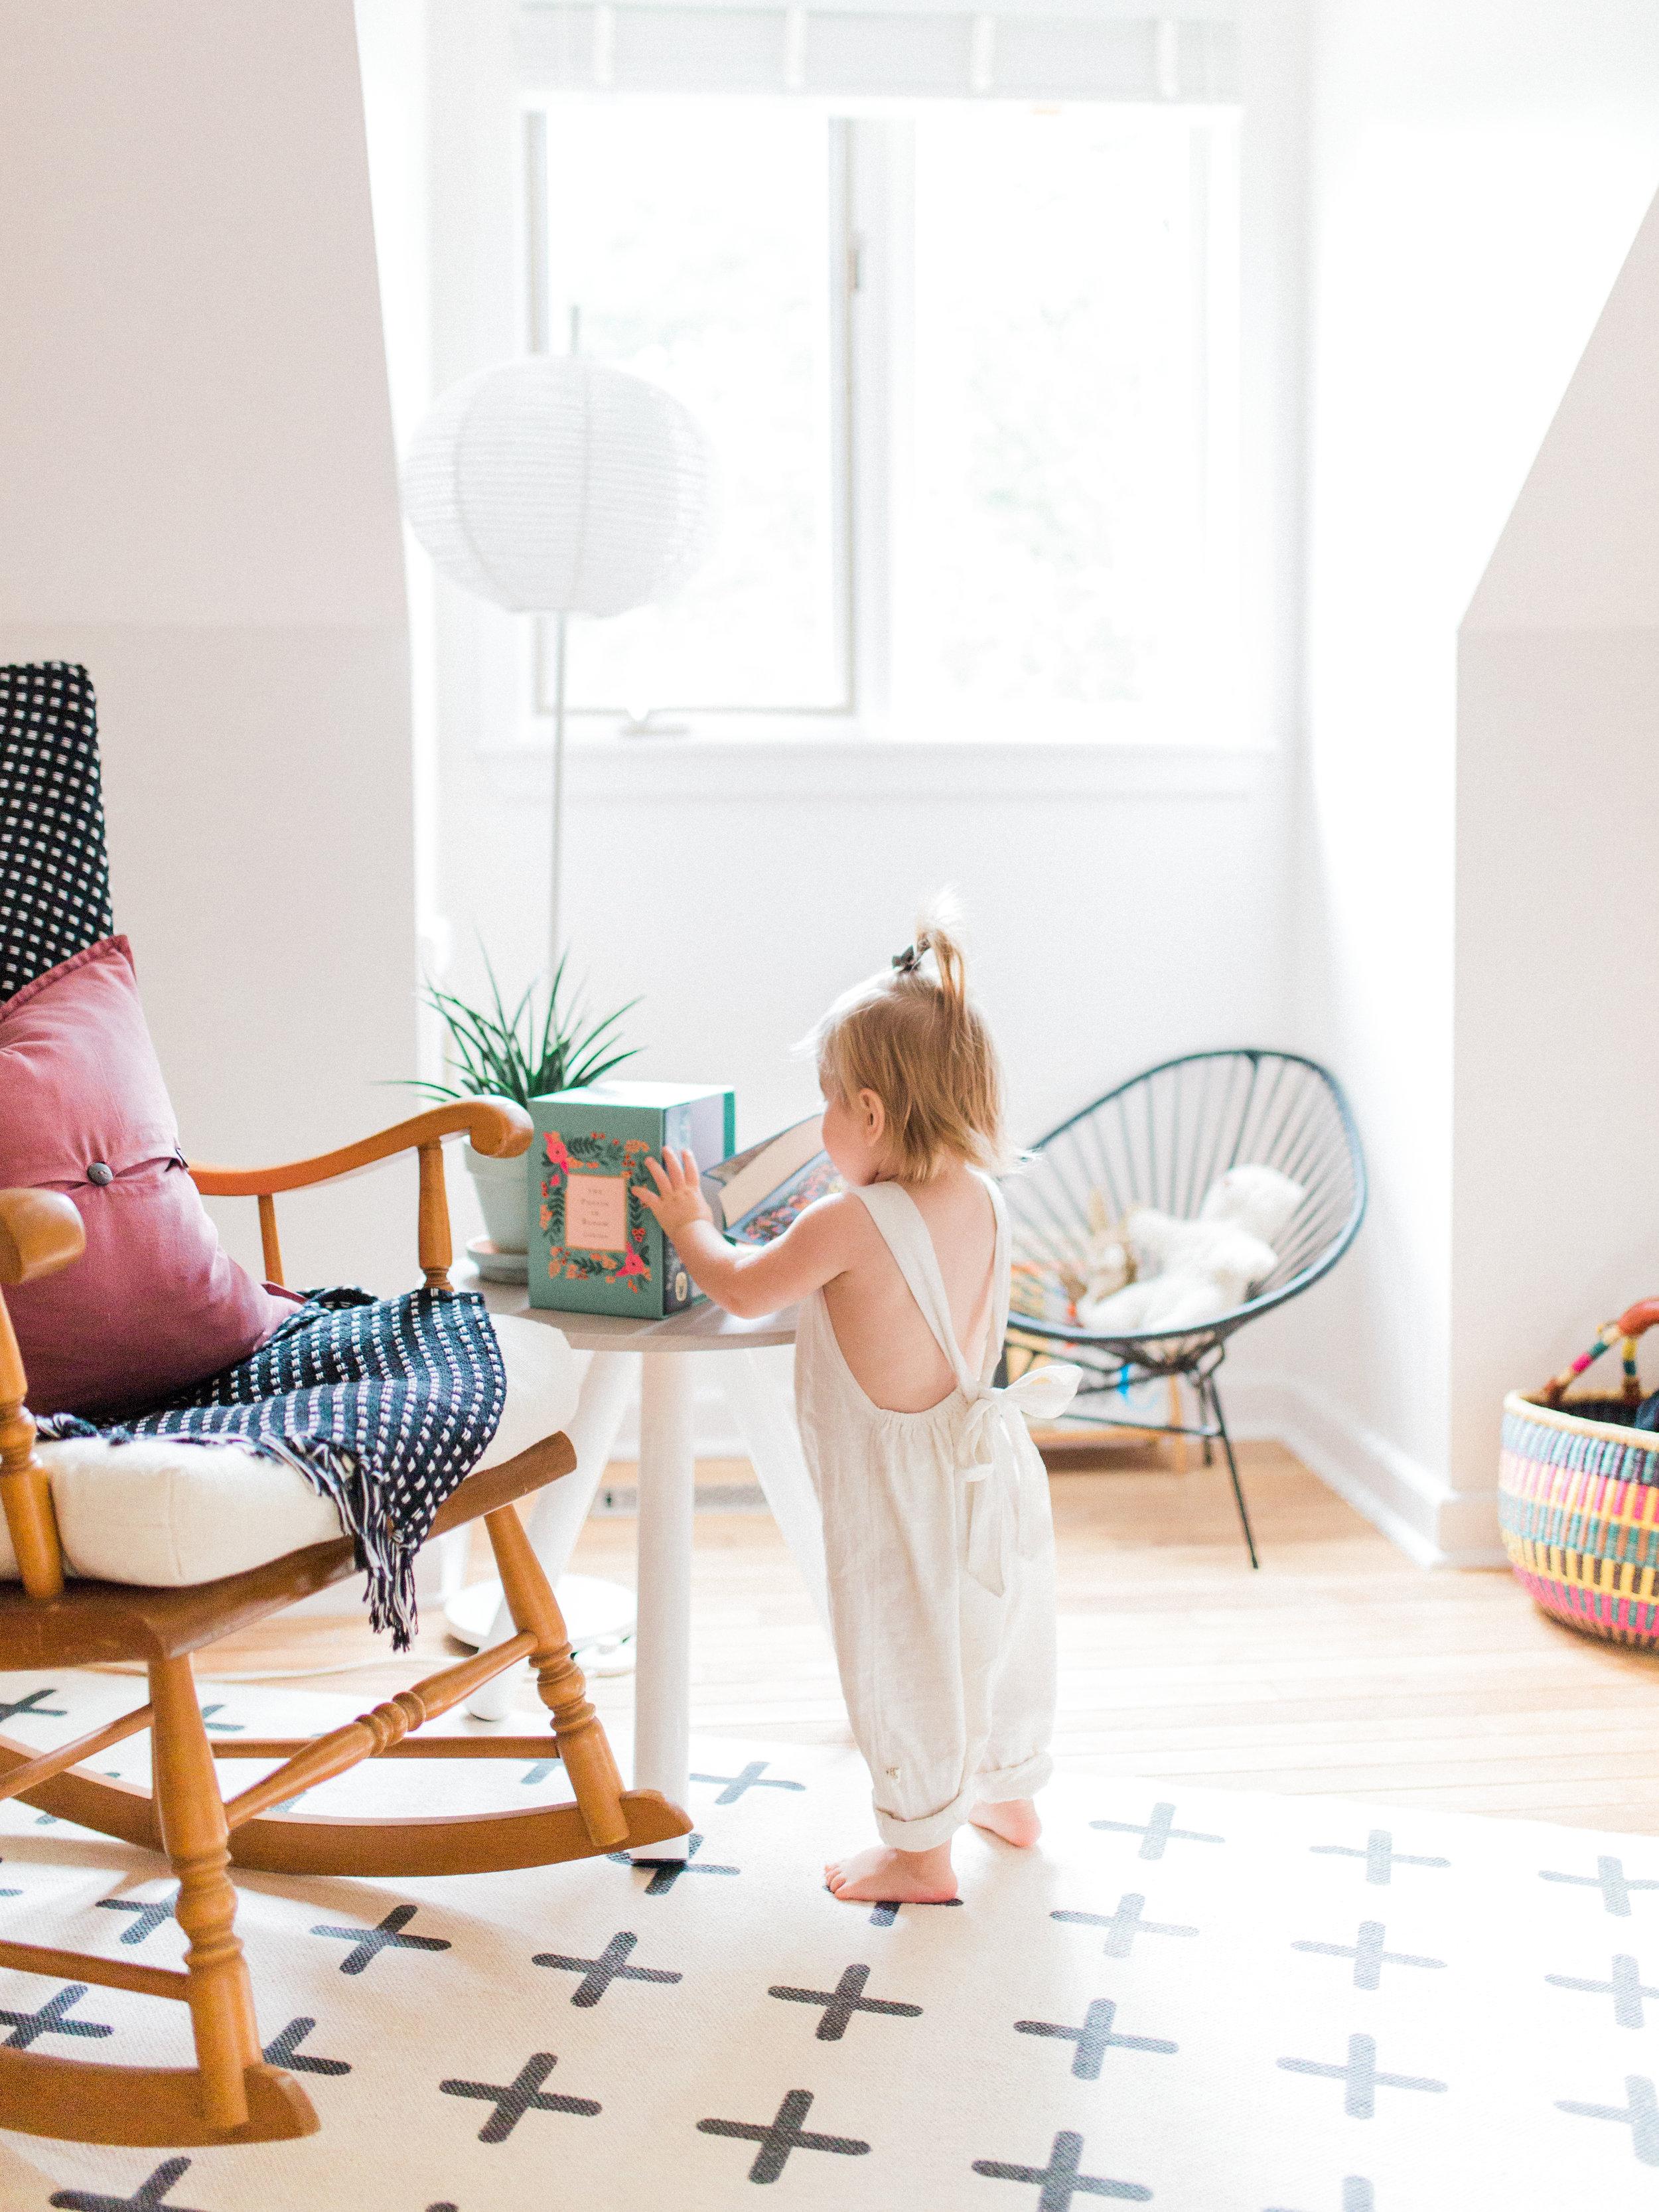 Elza Photographie - Toronto maternity photographer - Film and digital - Bright and airy - Mastin Labs - Motherhood